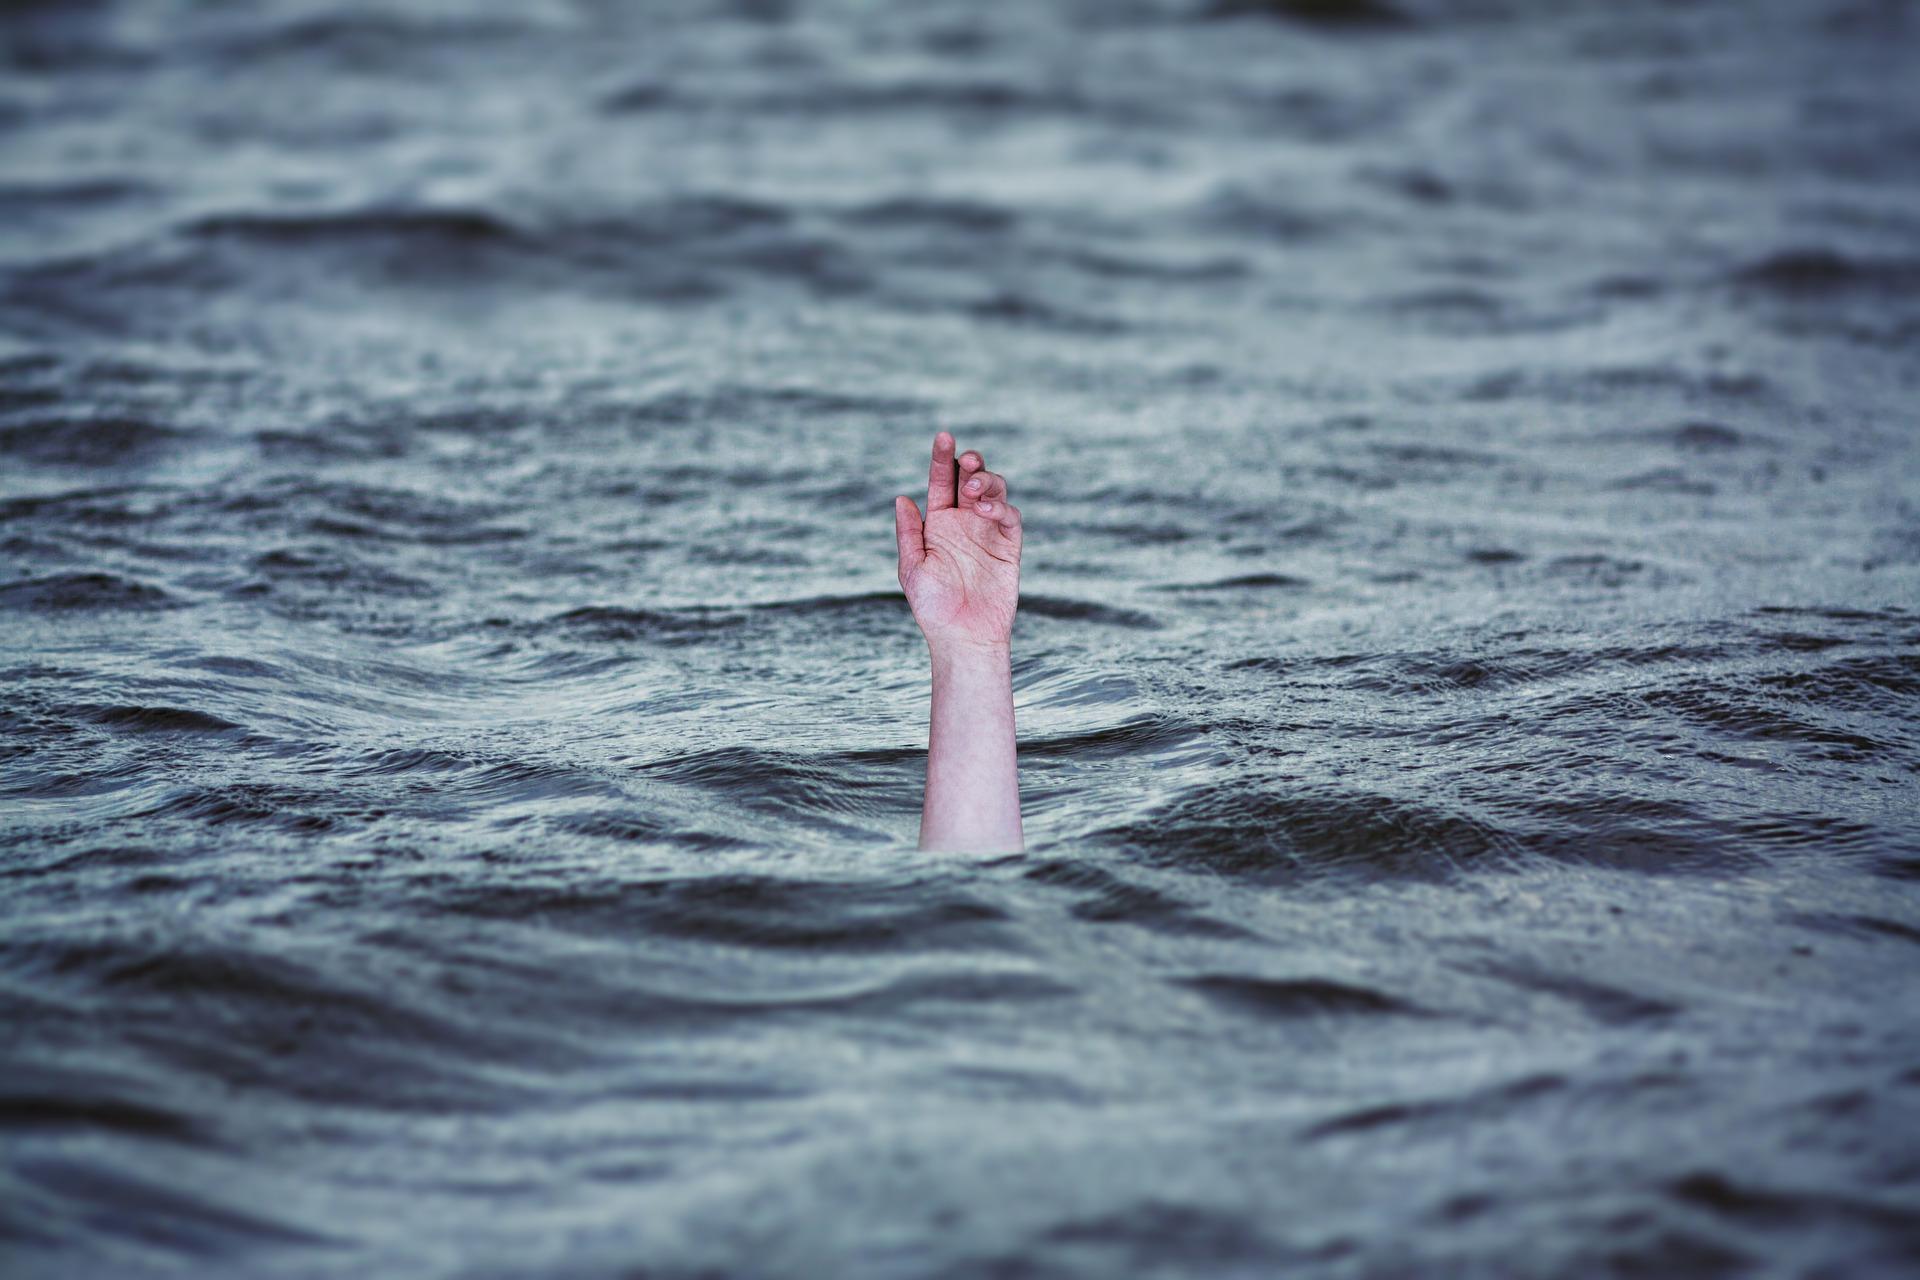 drowning-2049247_1920.jpg